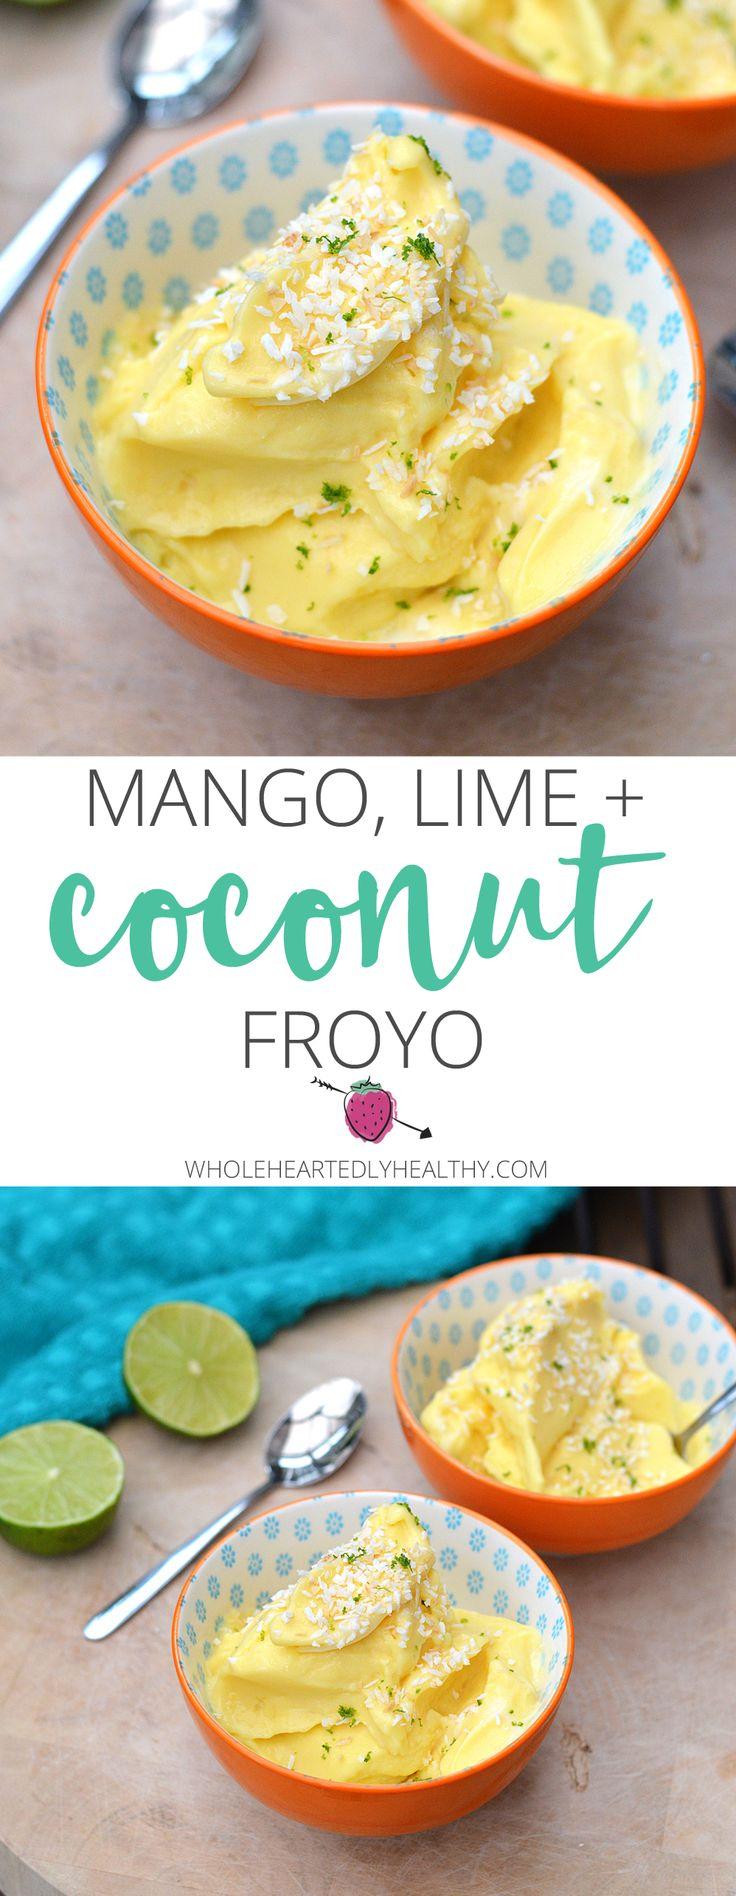 Mango, Lime and Coconut Frozen Yoghurt, perfect healthy summer dessert!